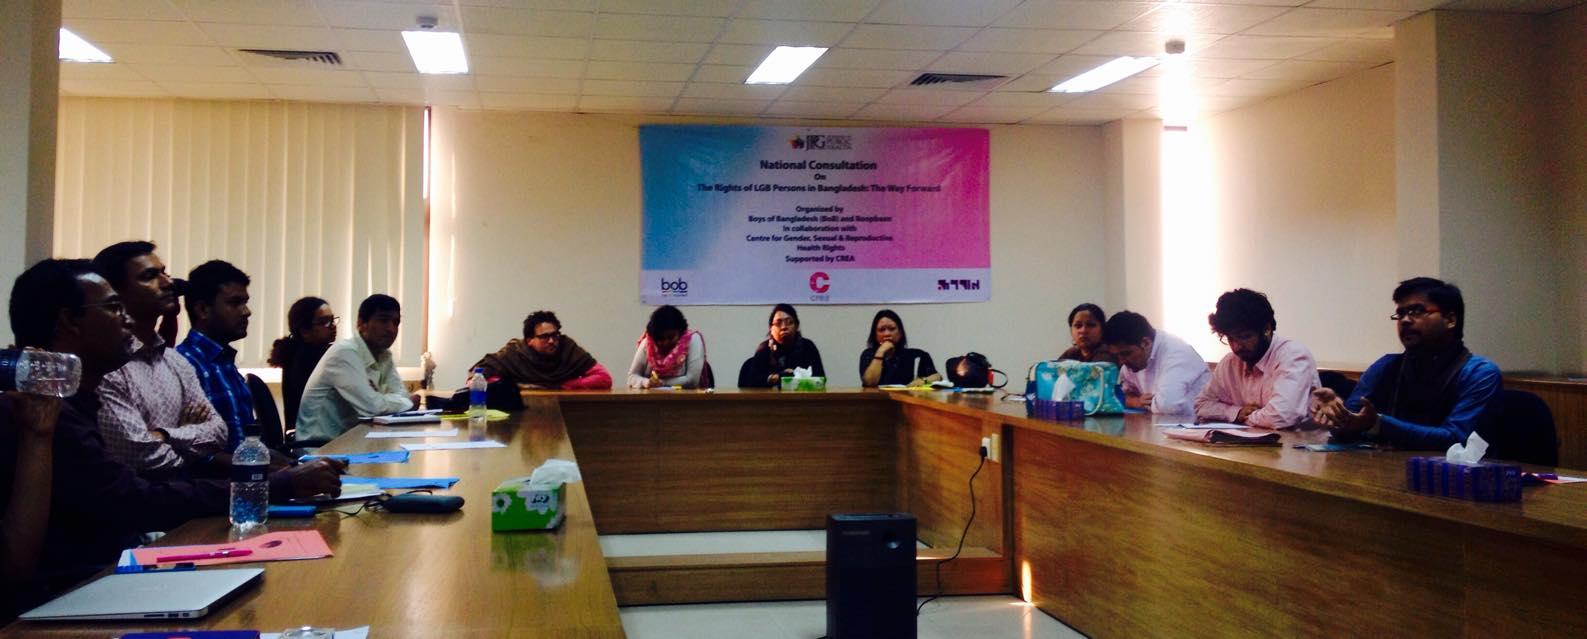 Dhaka, Bangladesh News conference announcing survey results (Photo courtesy BoB Facebook page)